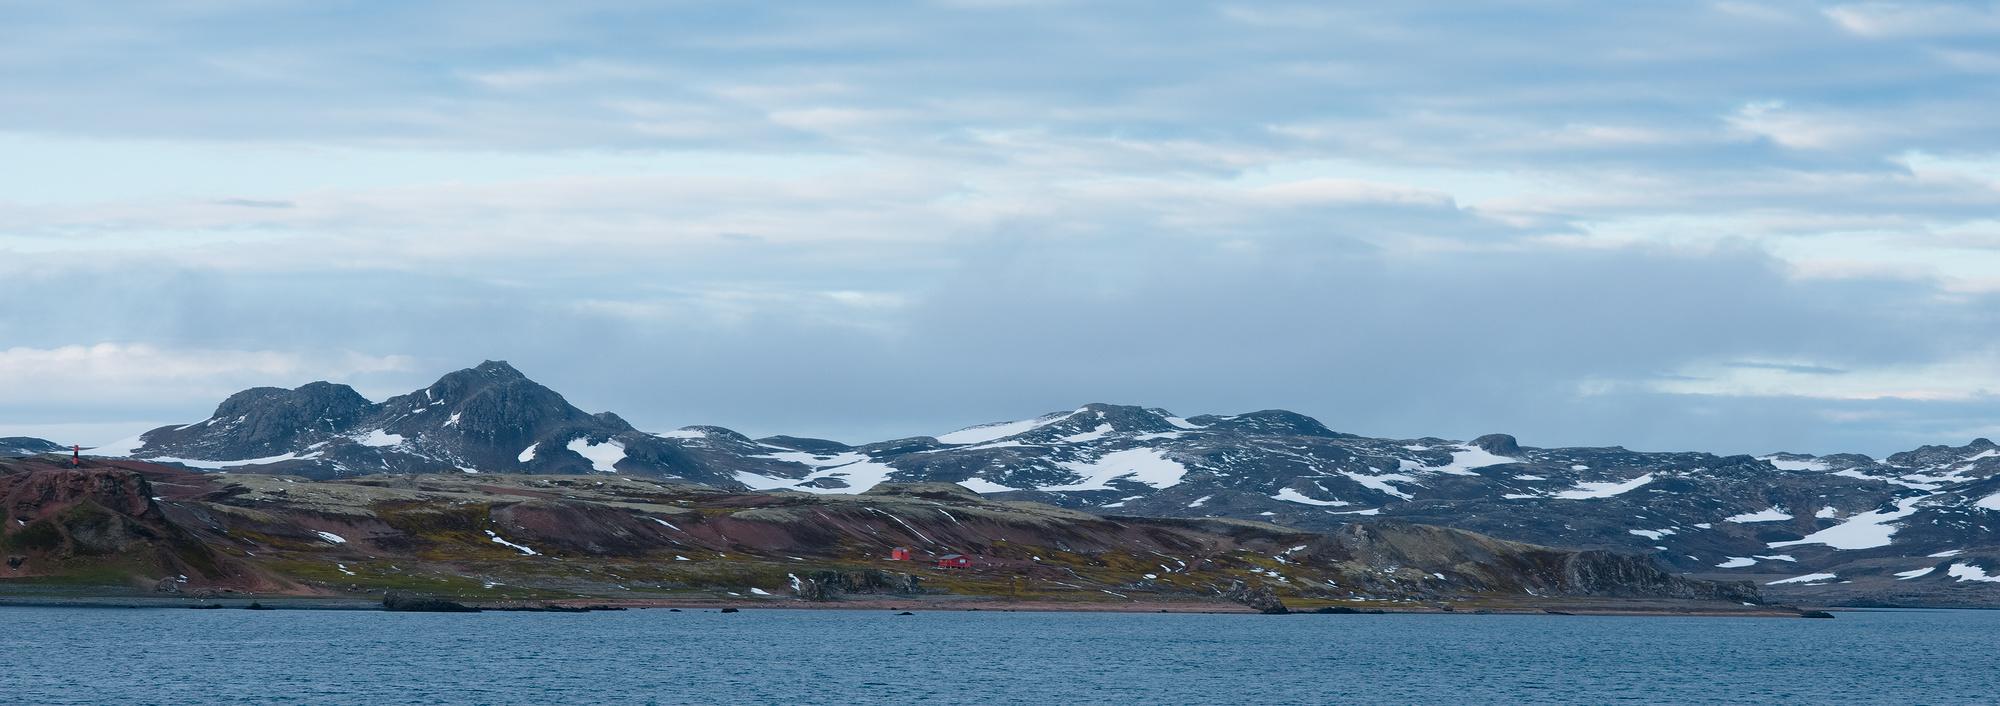 Icy Antarctic adventure of the SA Aghulas II